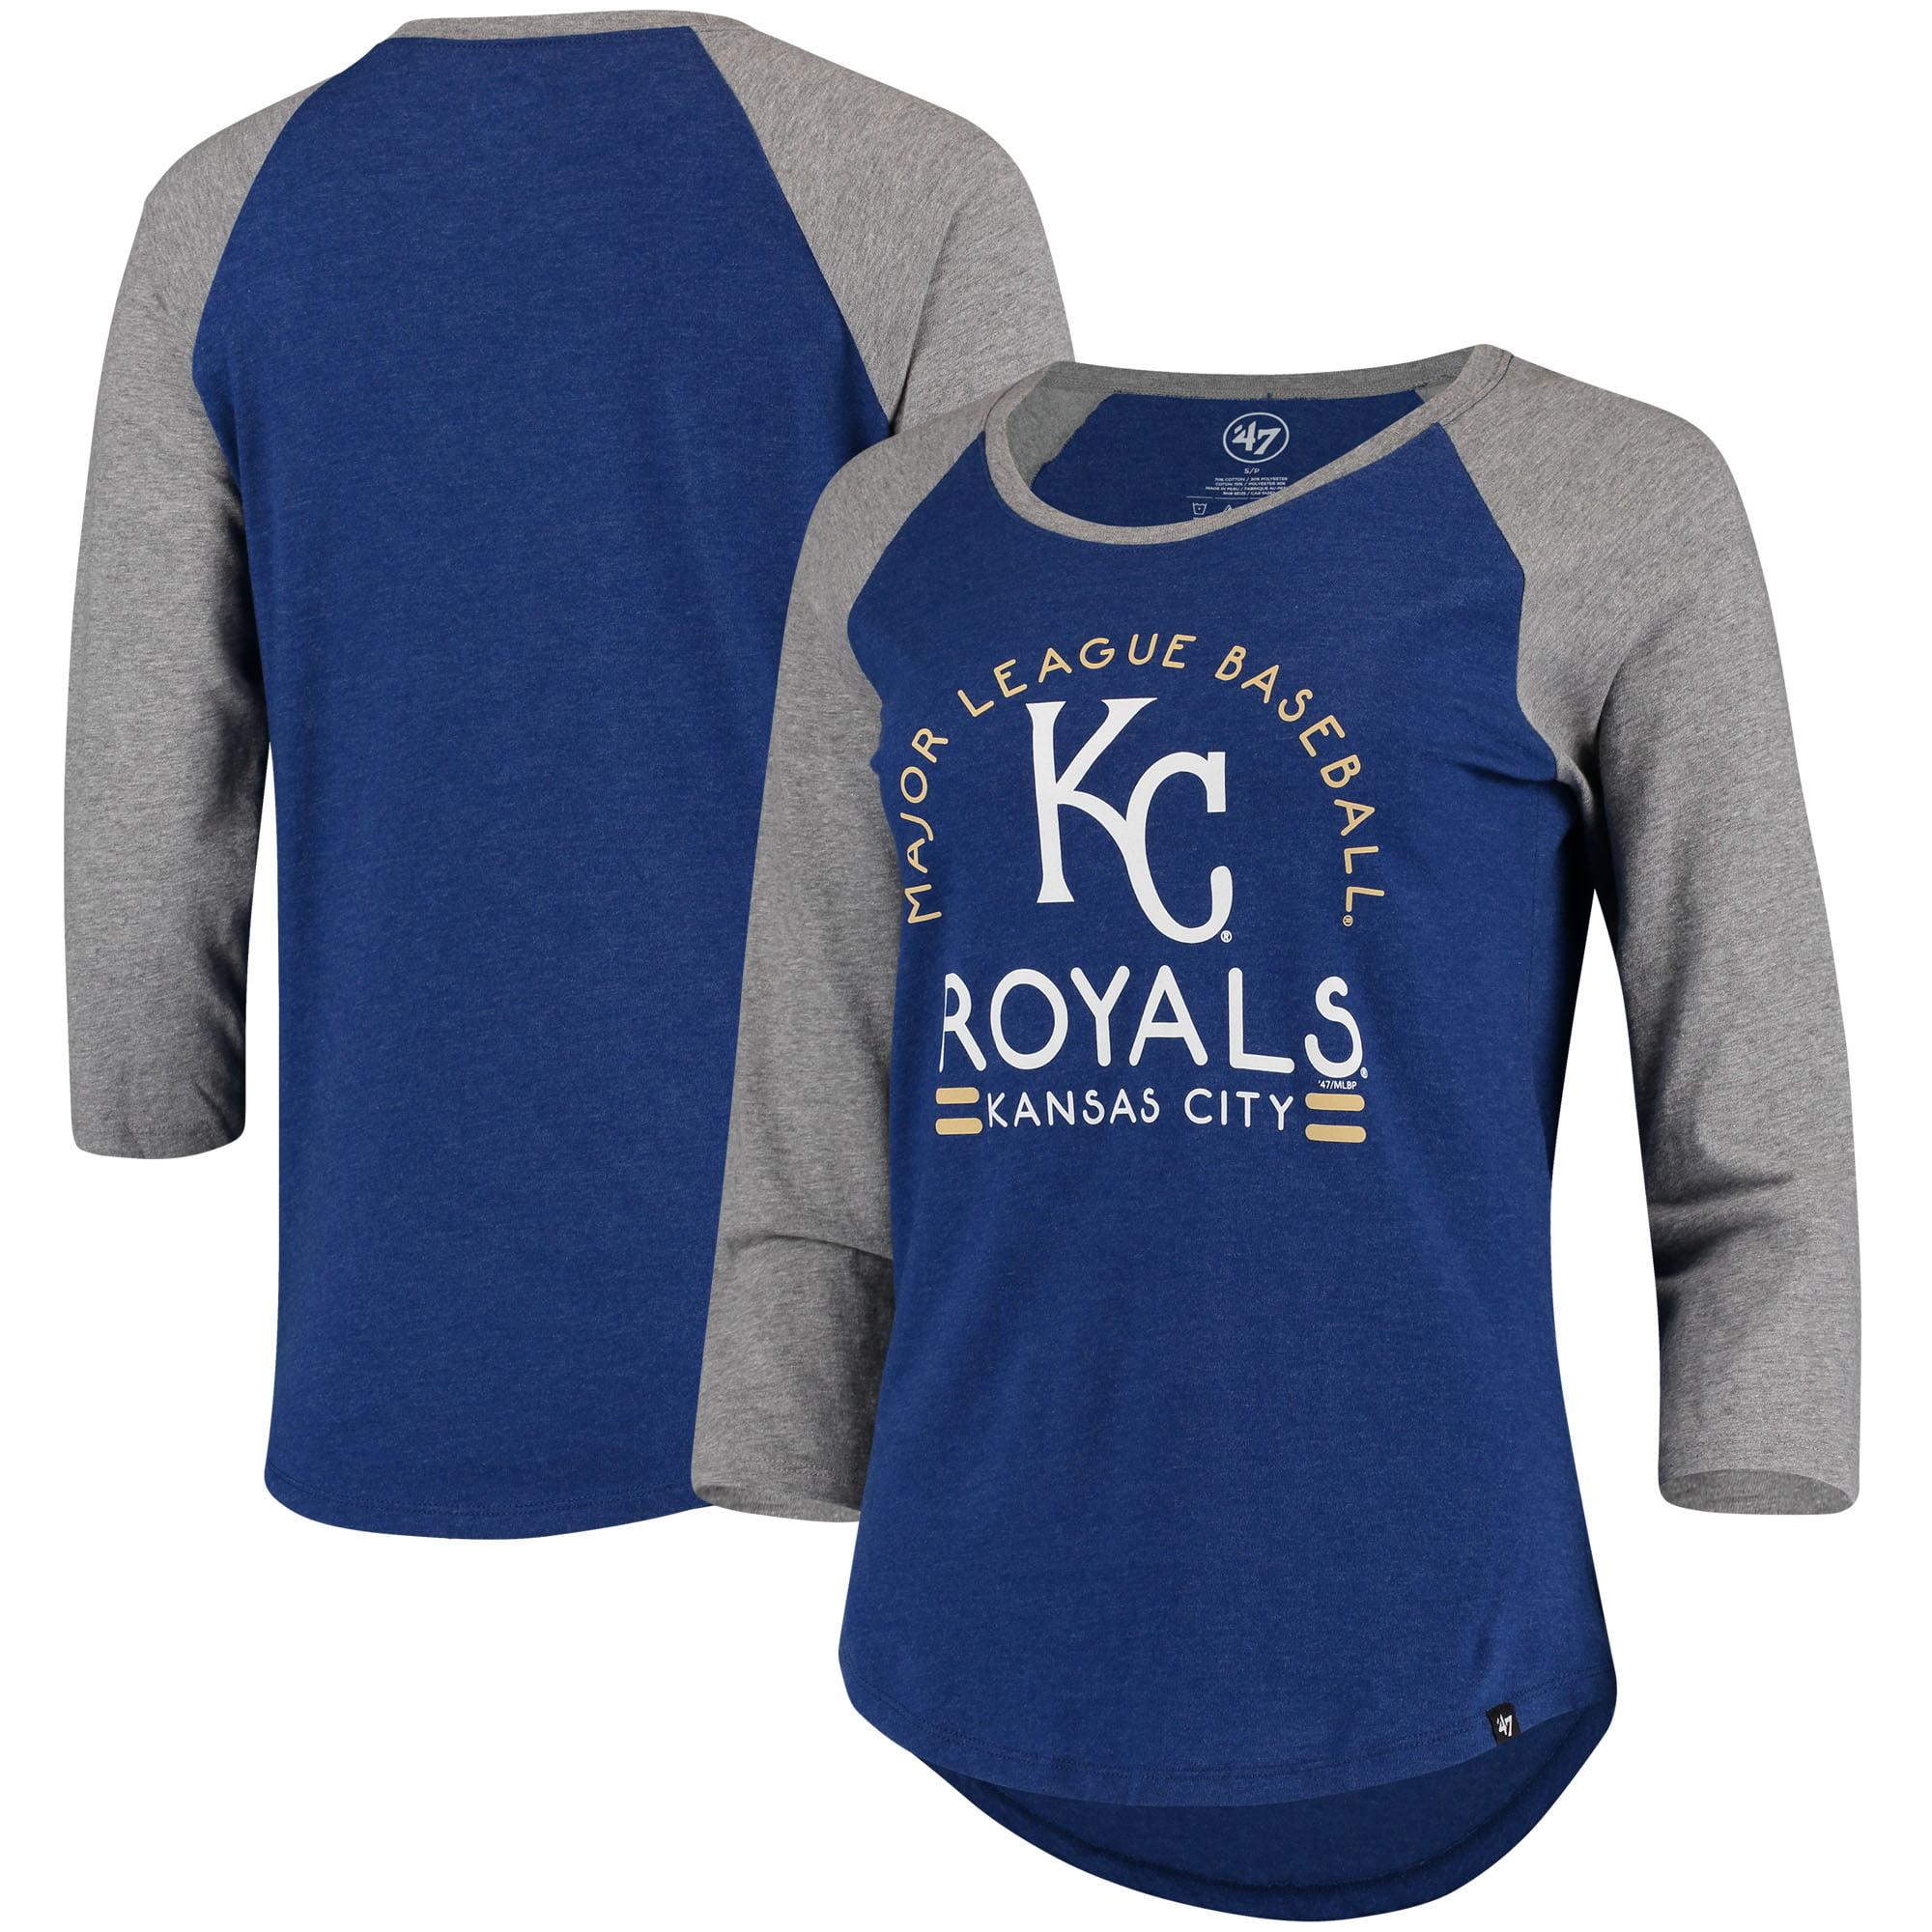 Kansas City Royals '47 Women's Club 3/4-Sleeve Raglan T-Shirt - Royal